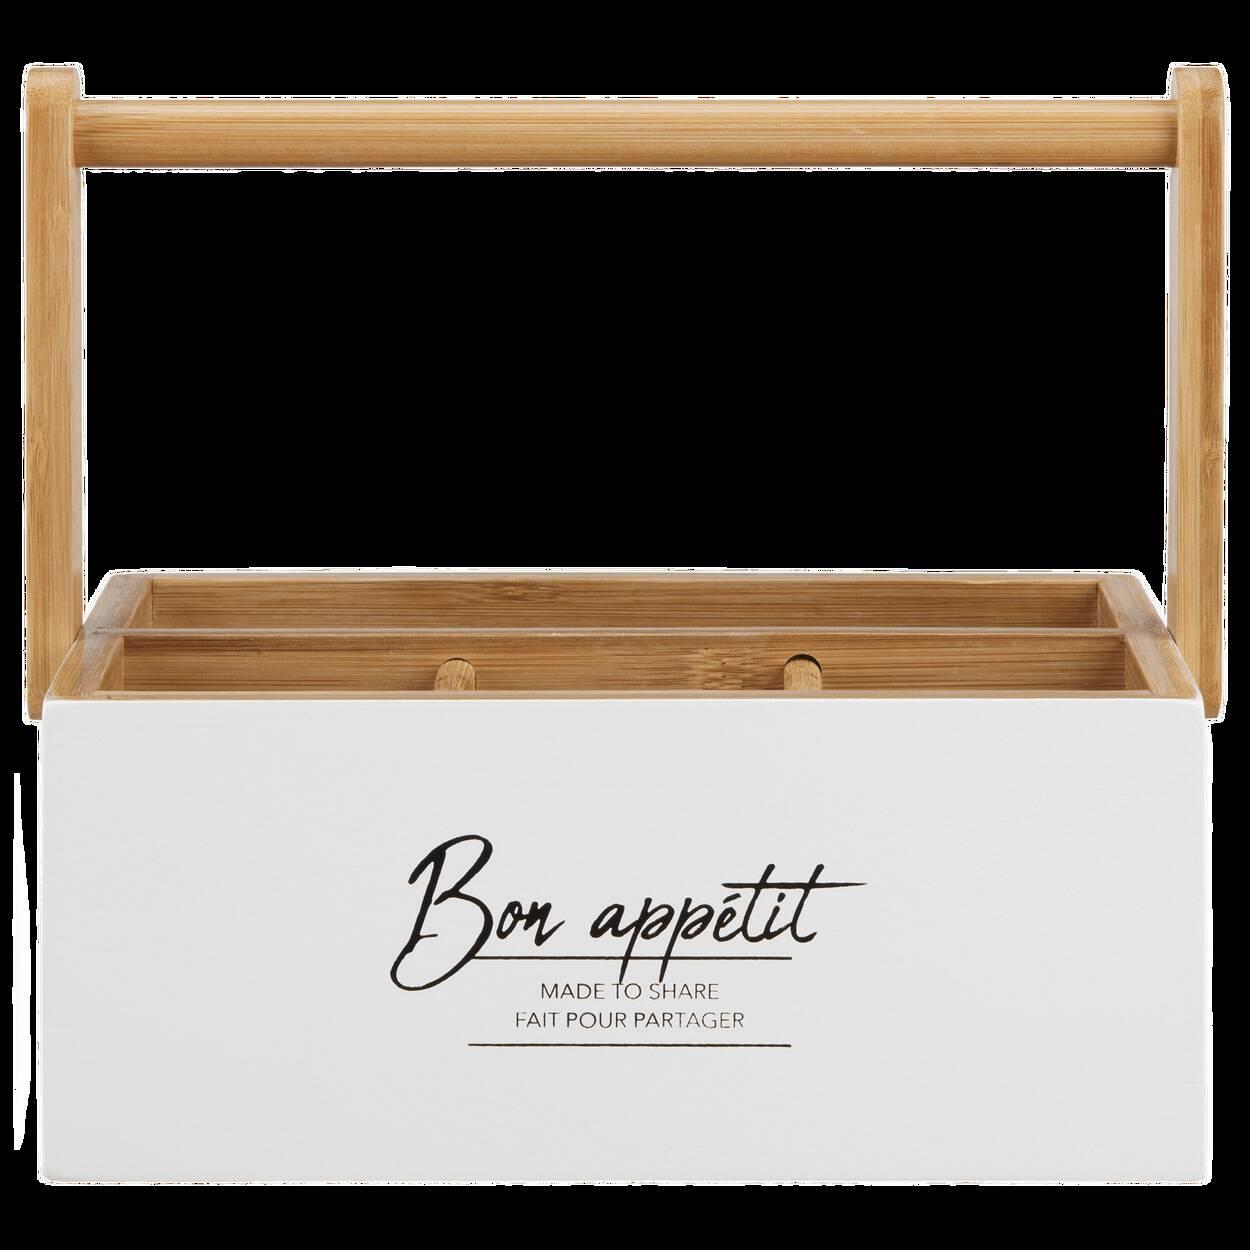 Porte-ustensiles avec typographie